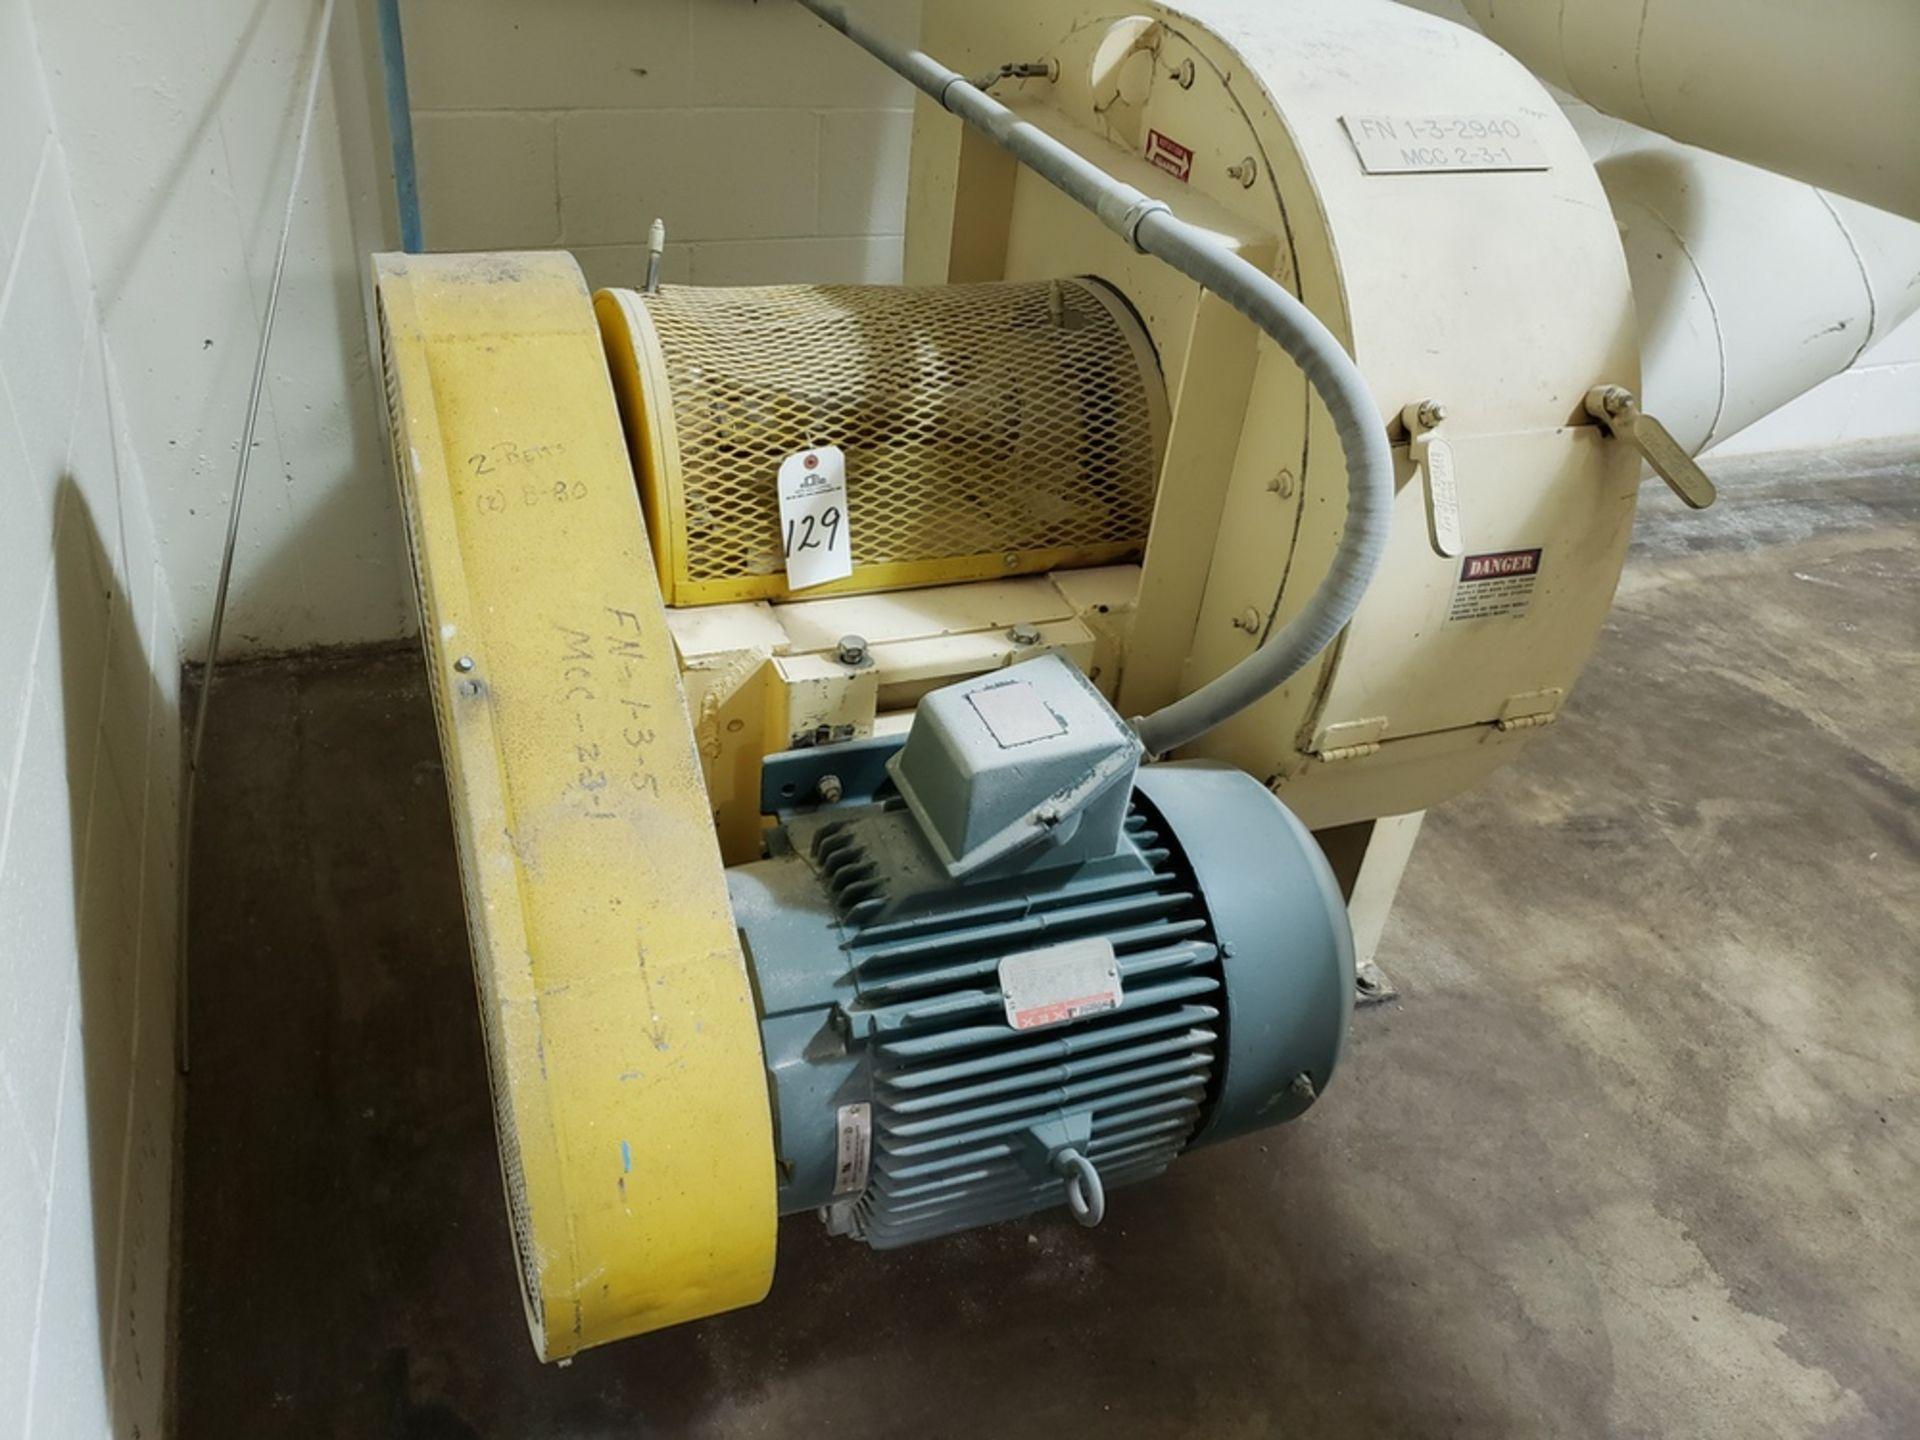 Lot 129 - 25 HP Blower | Rig Fee: $250